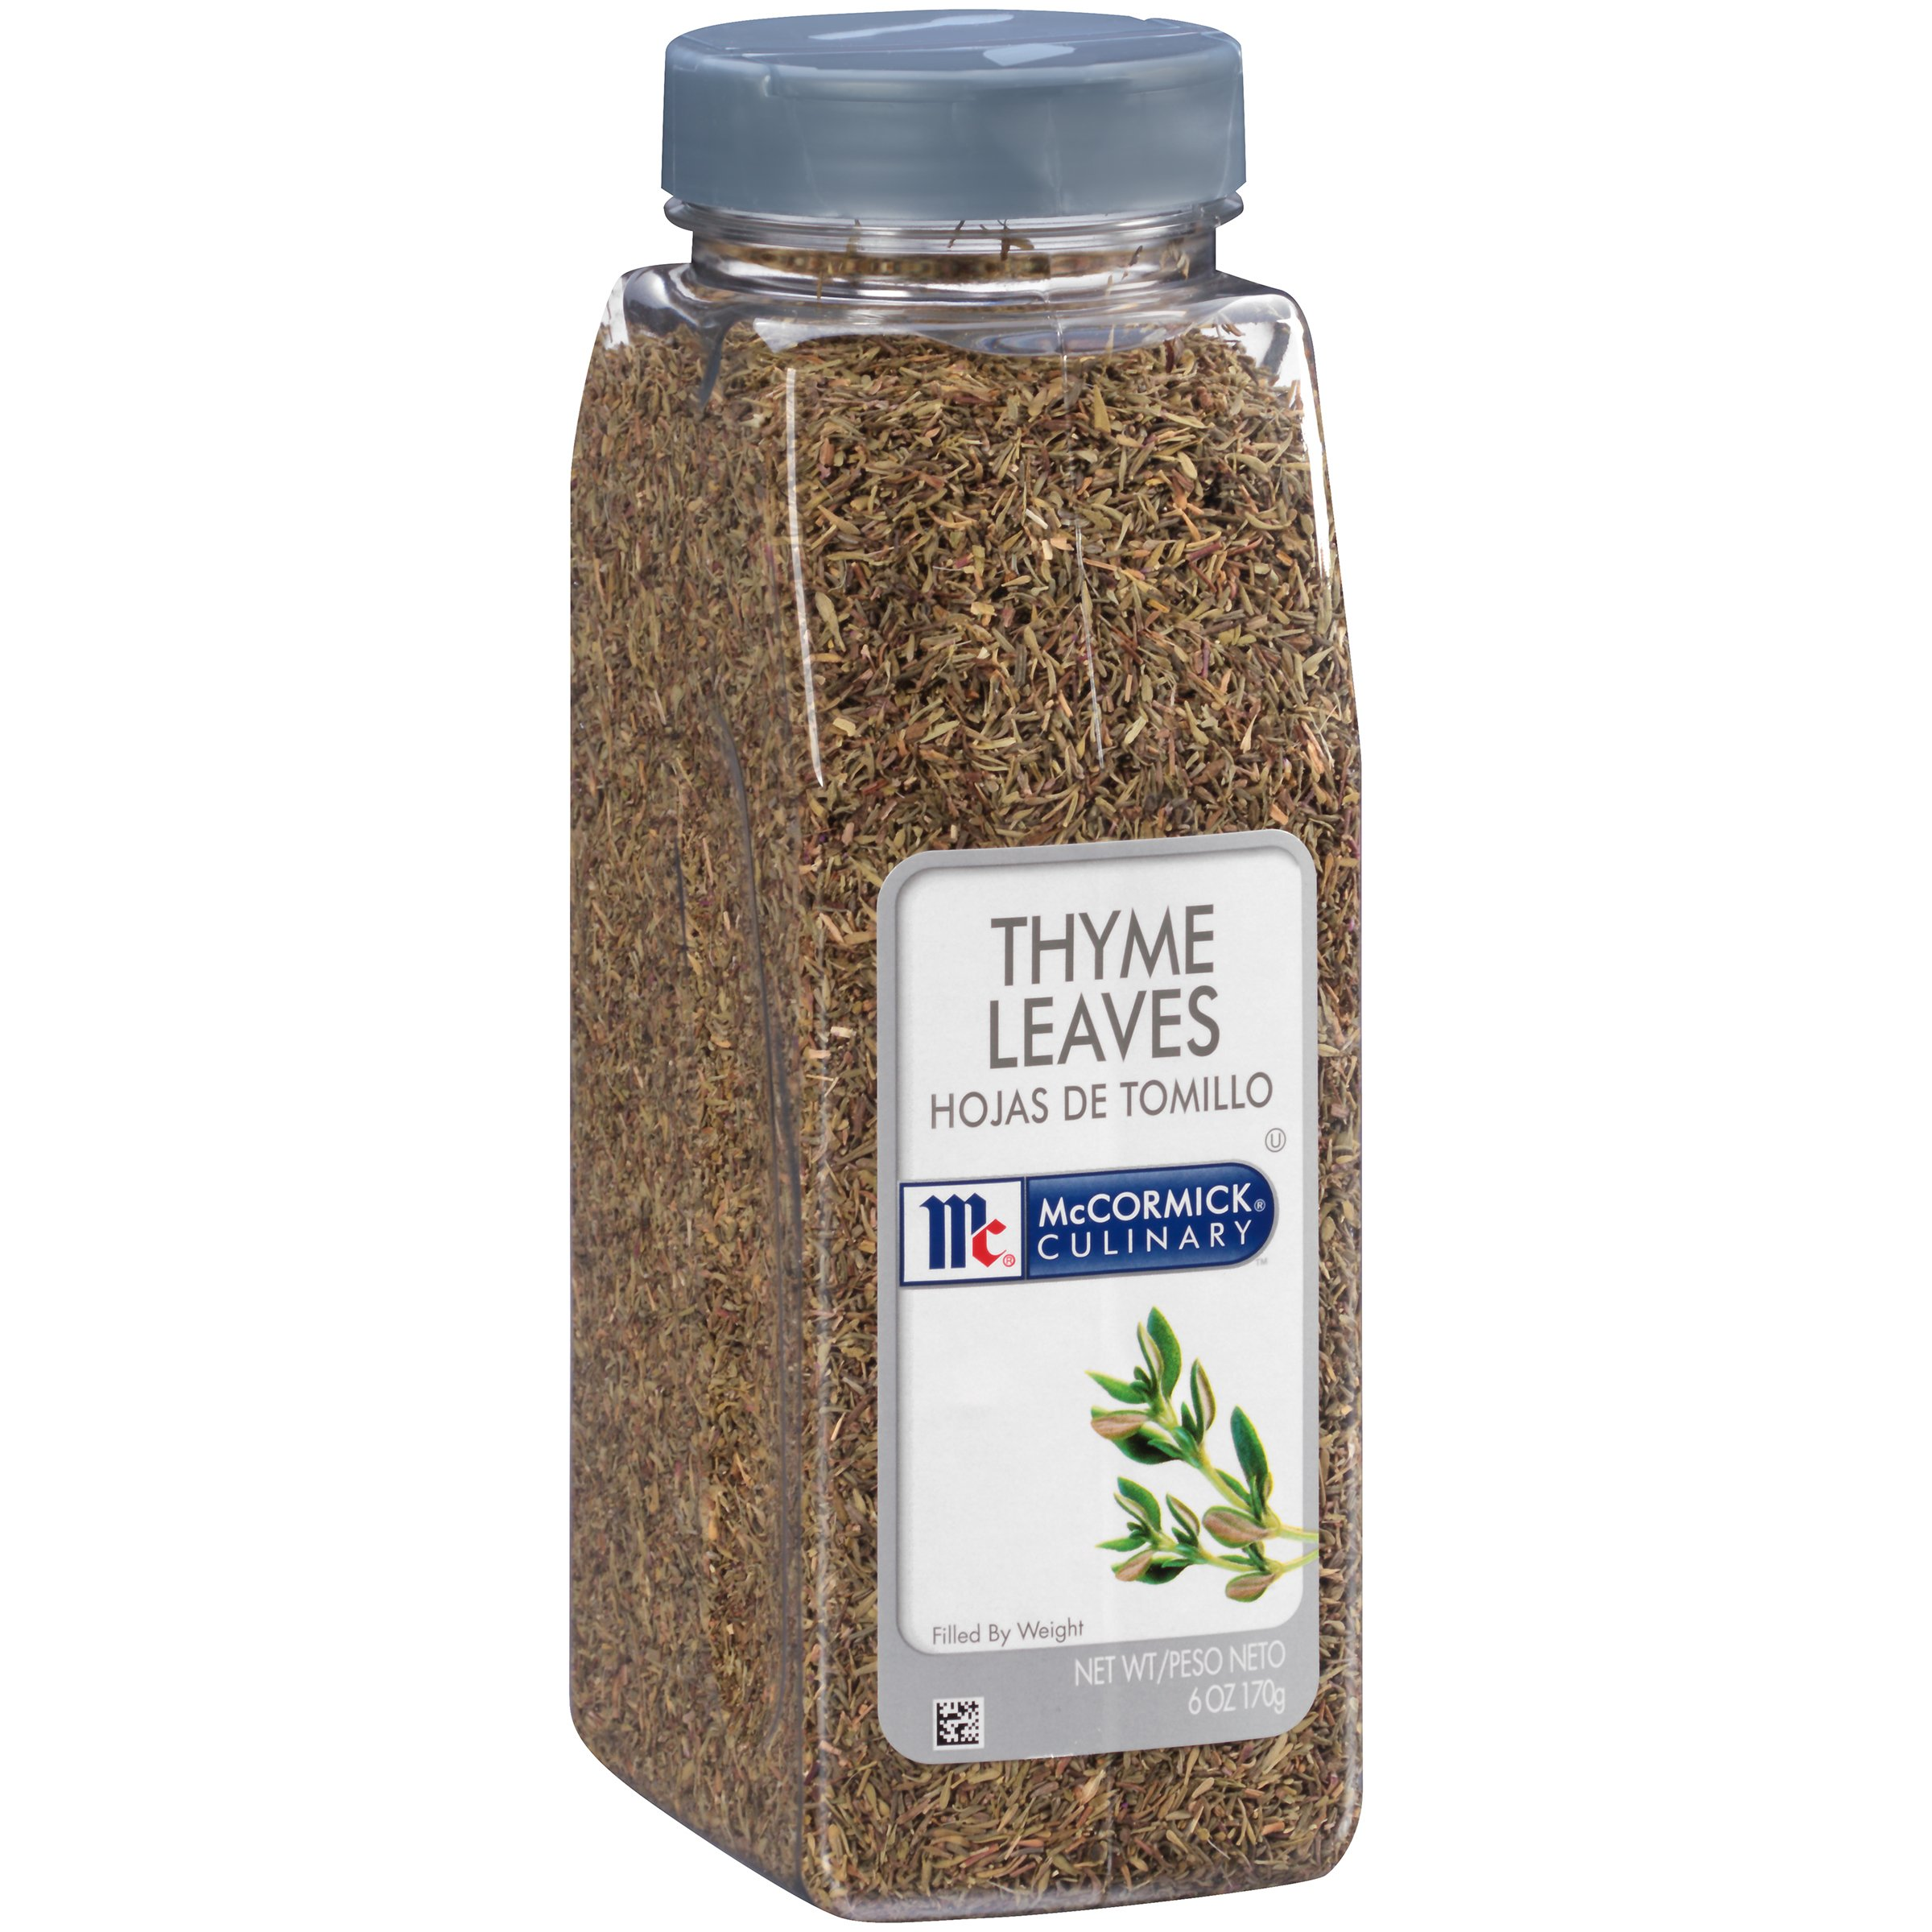 McCormick Thyme Leaves 6 oz. , 6 per case